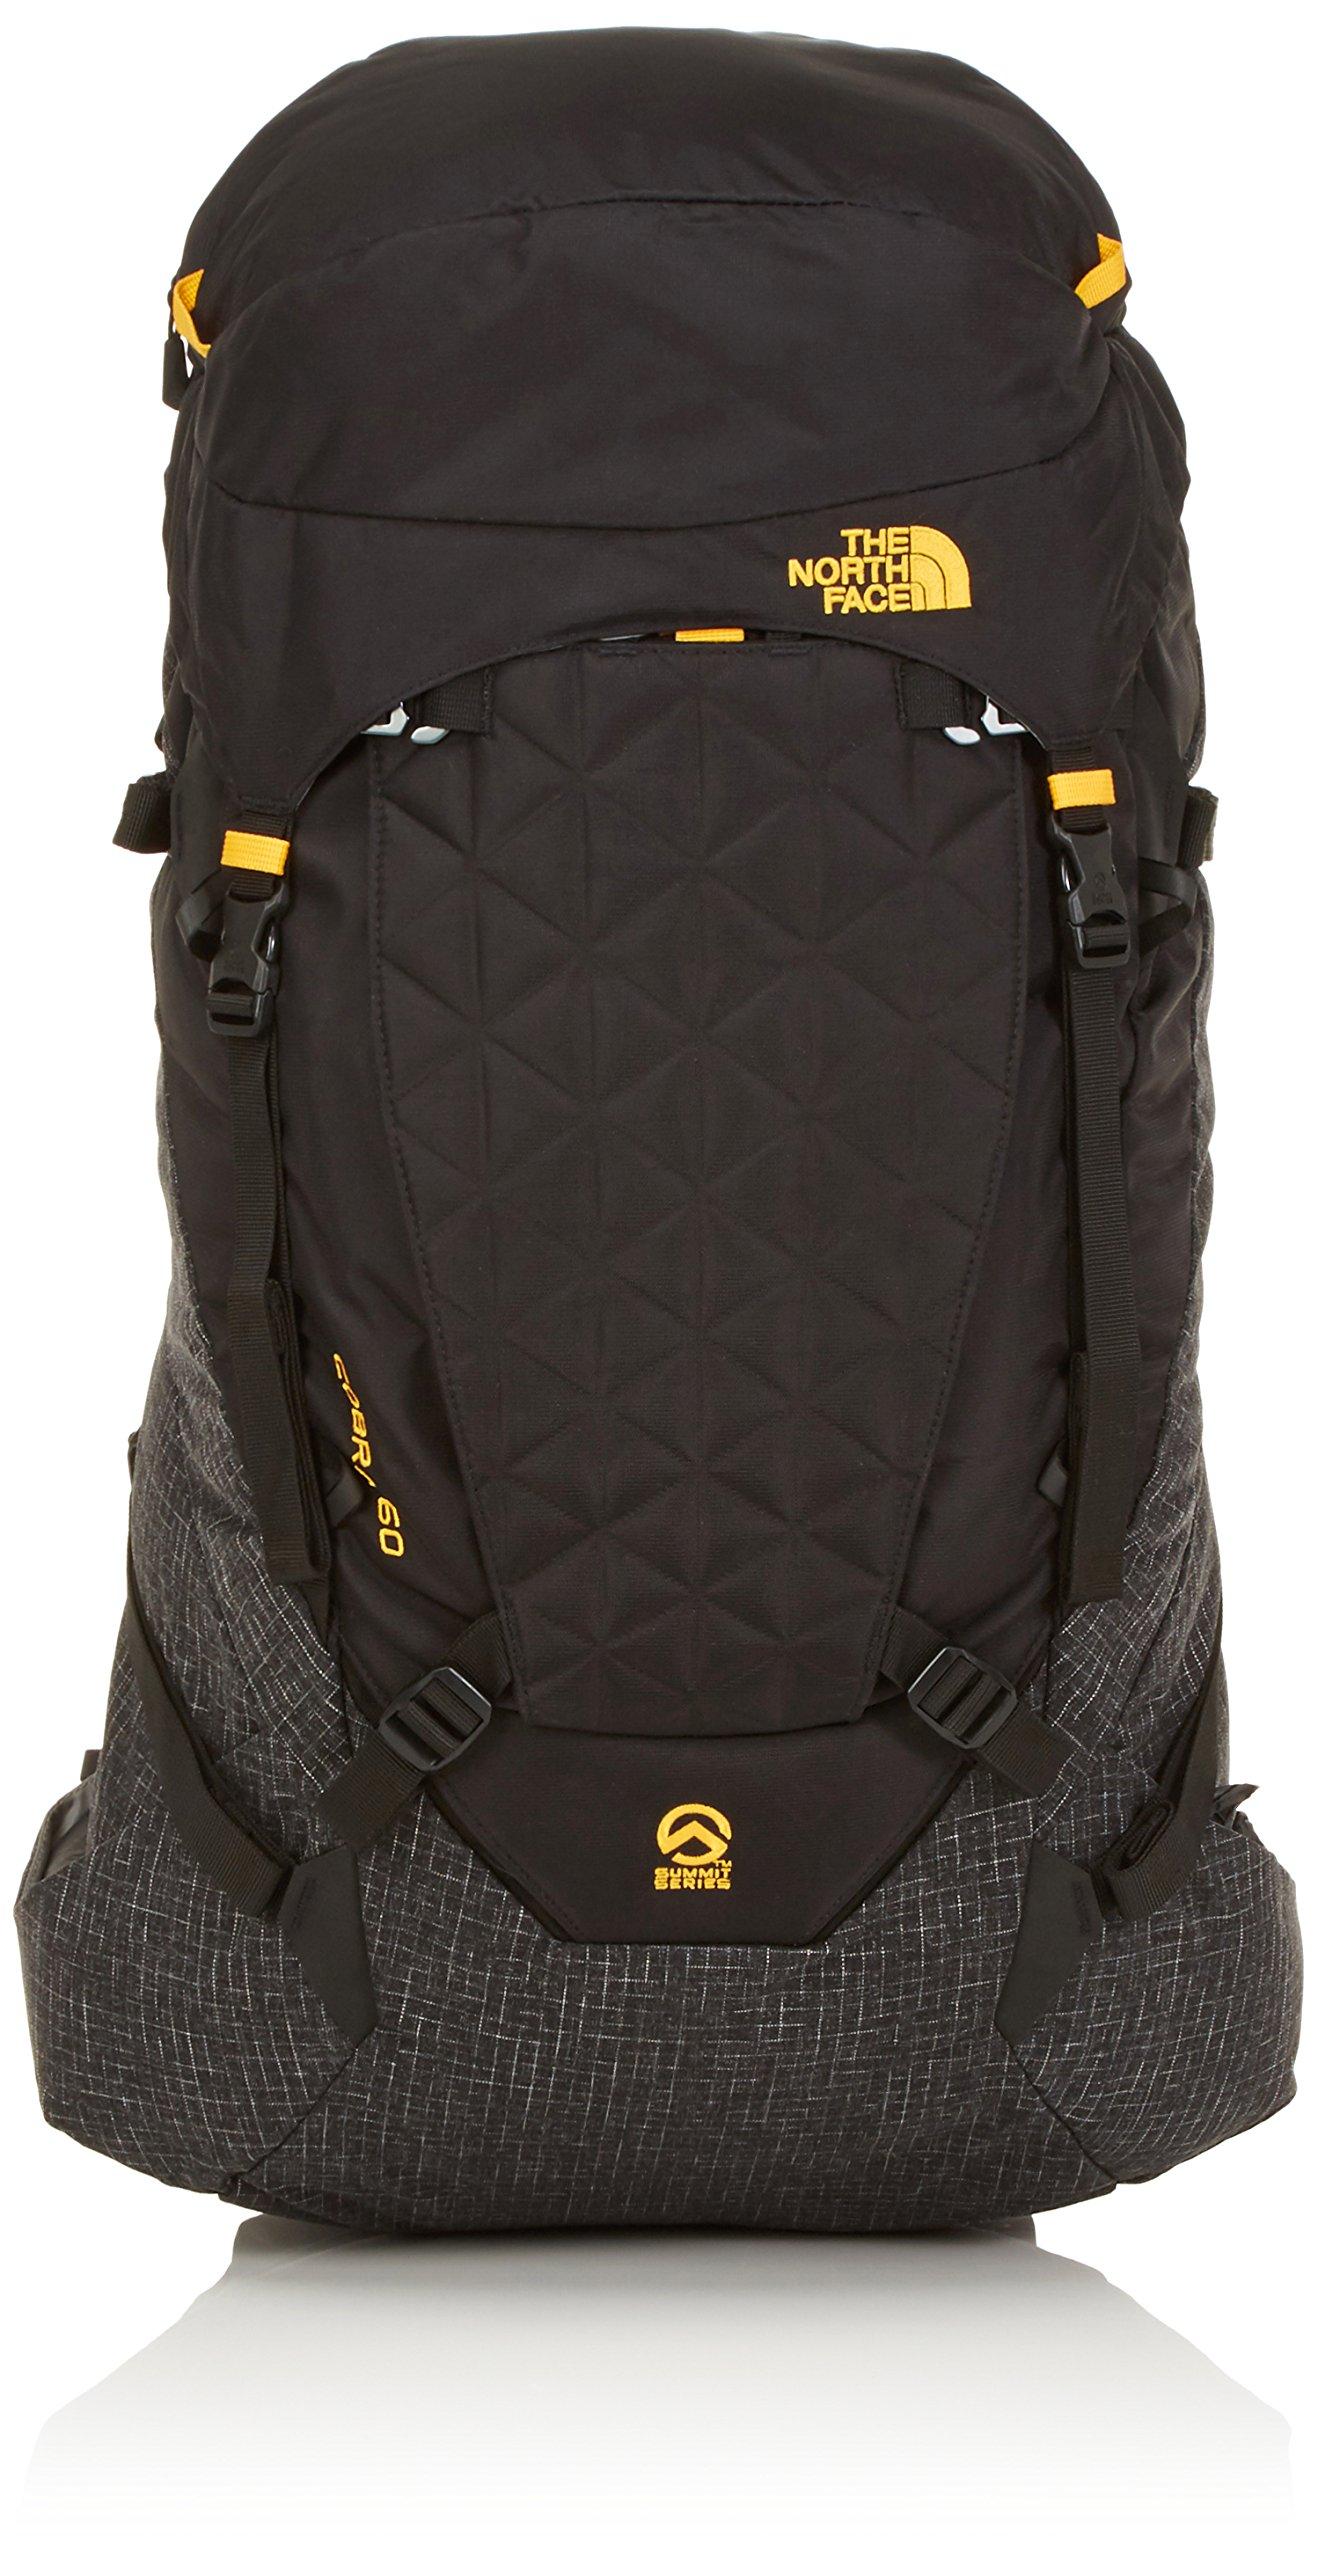 ویکالا · خرید  اصل اورجینال · خرید از آمازون · The North Face Cobra 60 Hiking Backpack TNF Black Summit Gold wekala · ویکالا